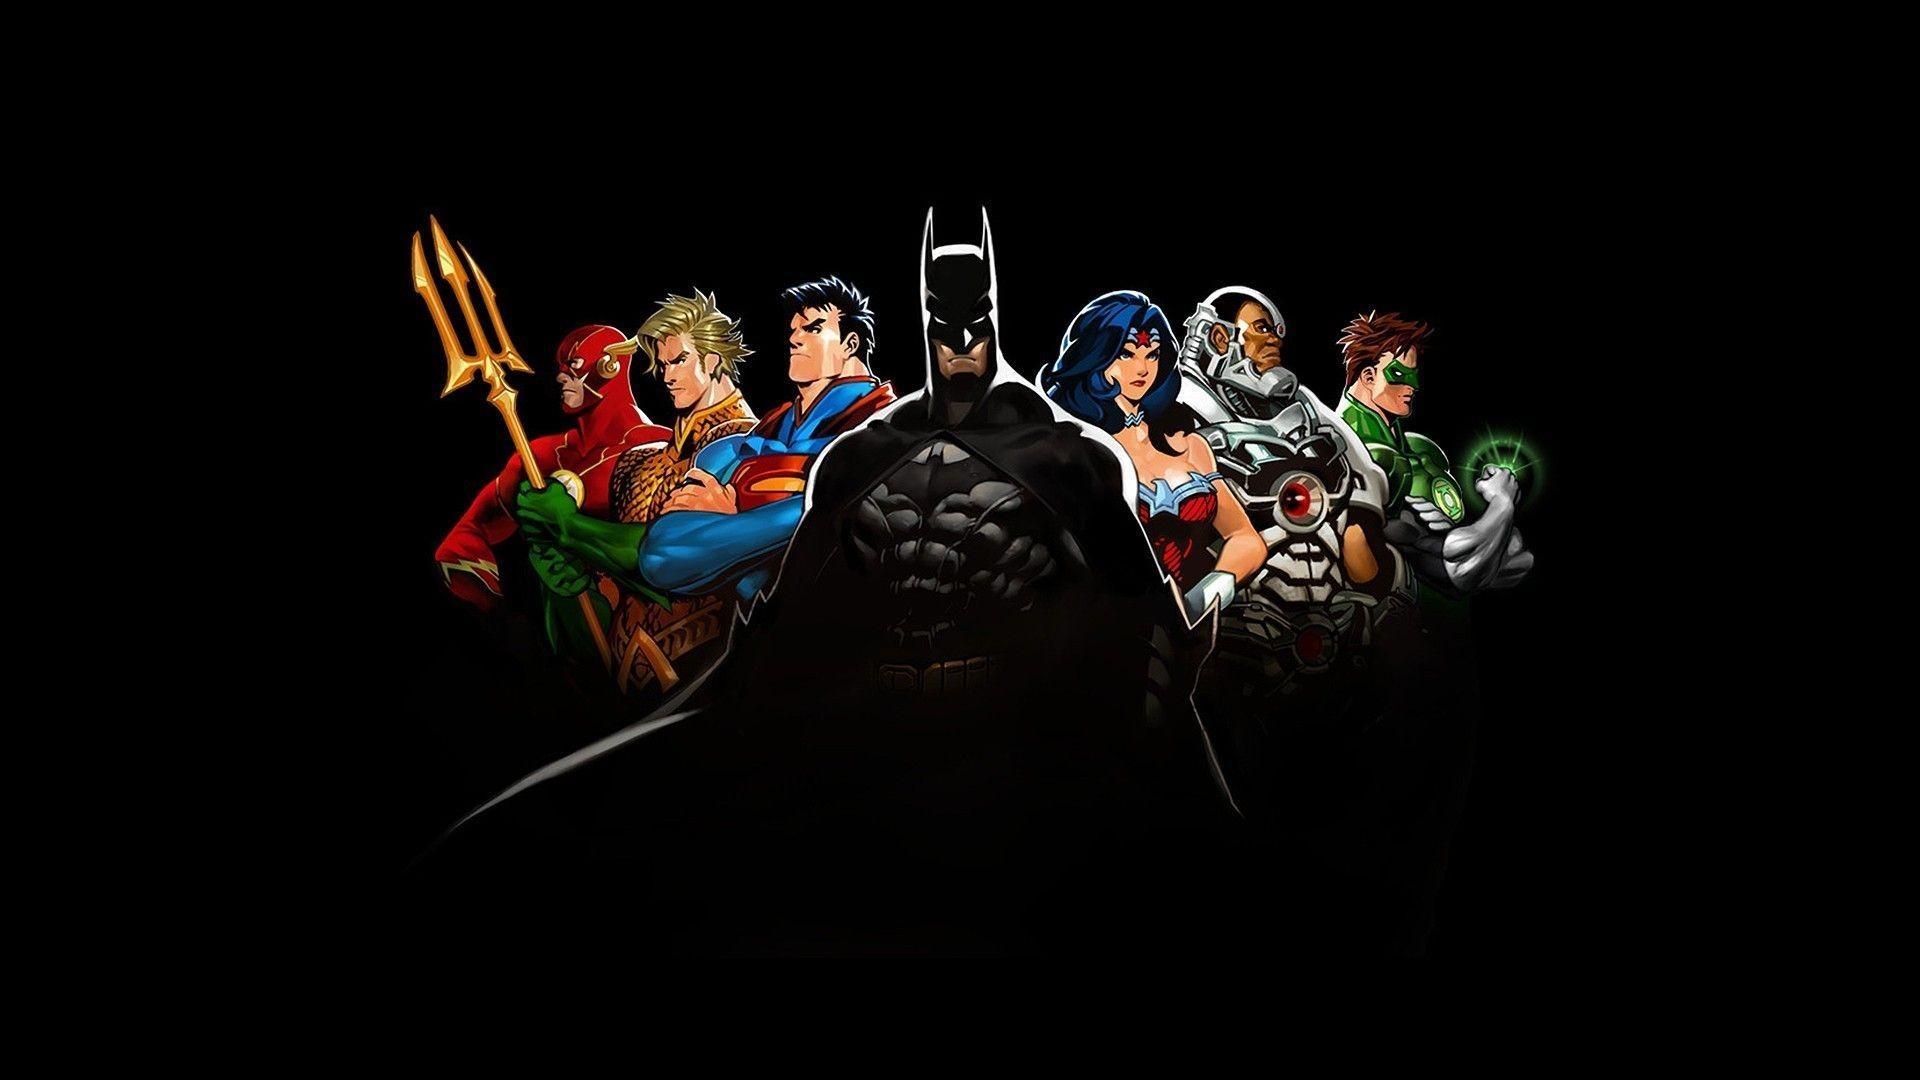 dc-comics-heroes-comic-hd-wallpaper-1920×1080-5068 –